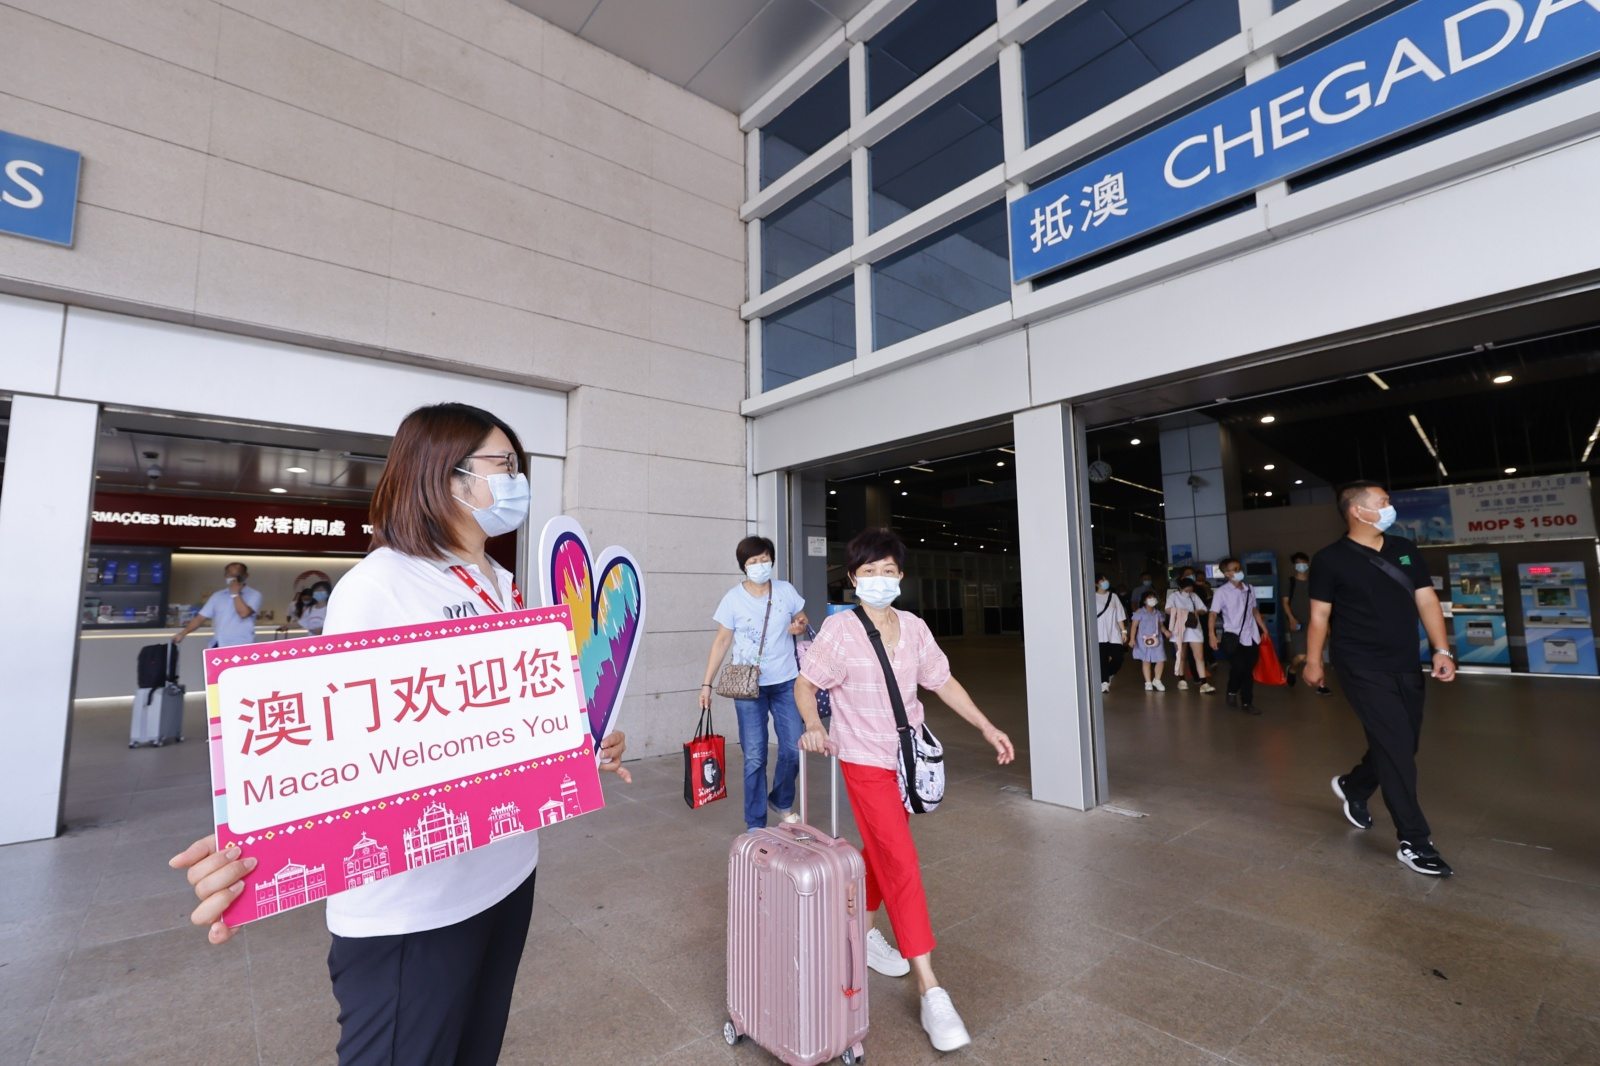 MGTO Macao Highlight Tours